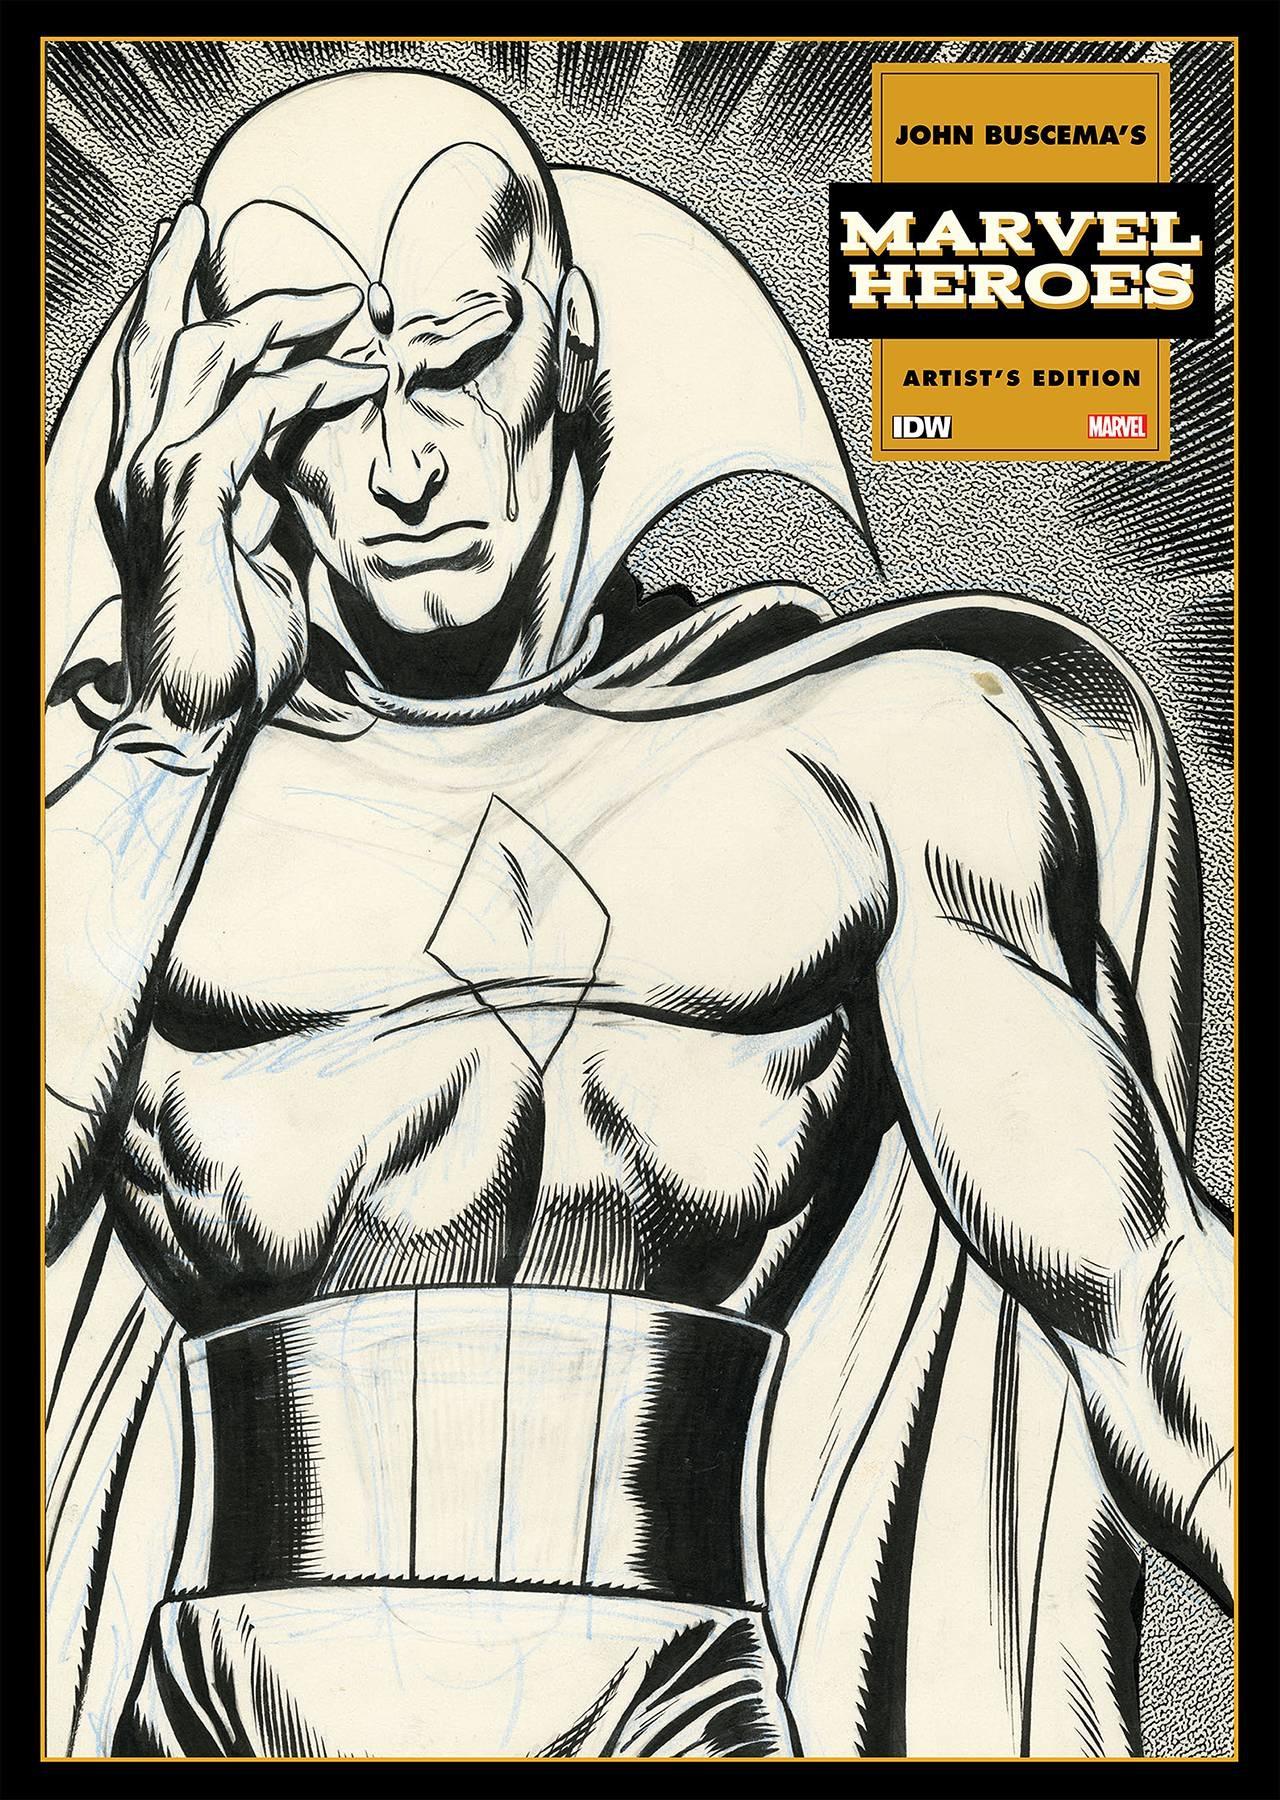 John Buscema's Marvel Heroes Artist's Edition cover prelim